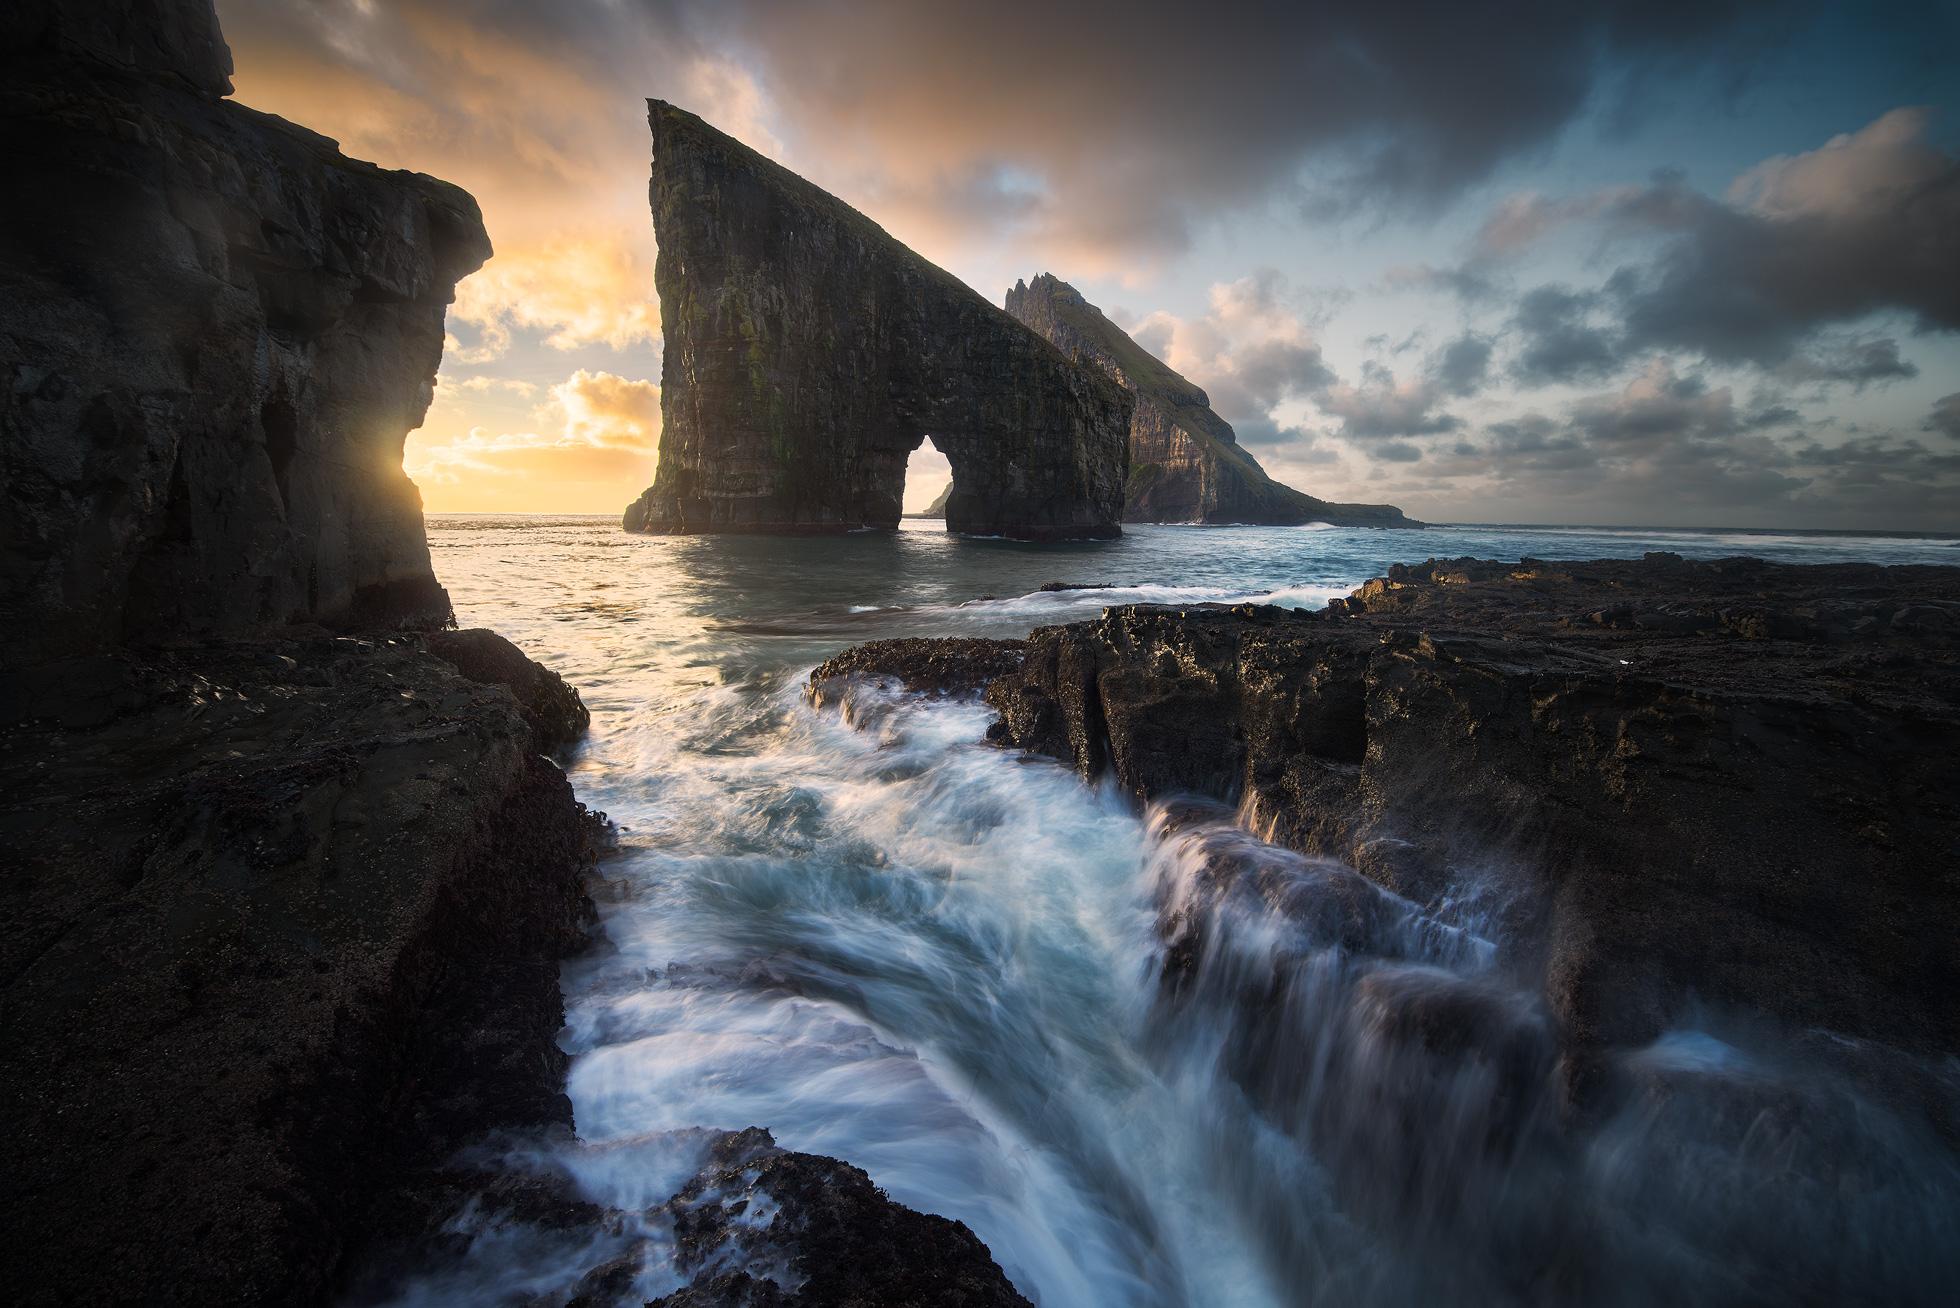 Golden hour long exposure seascape at the Faroe Islands